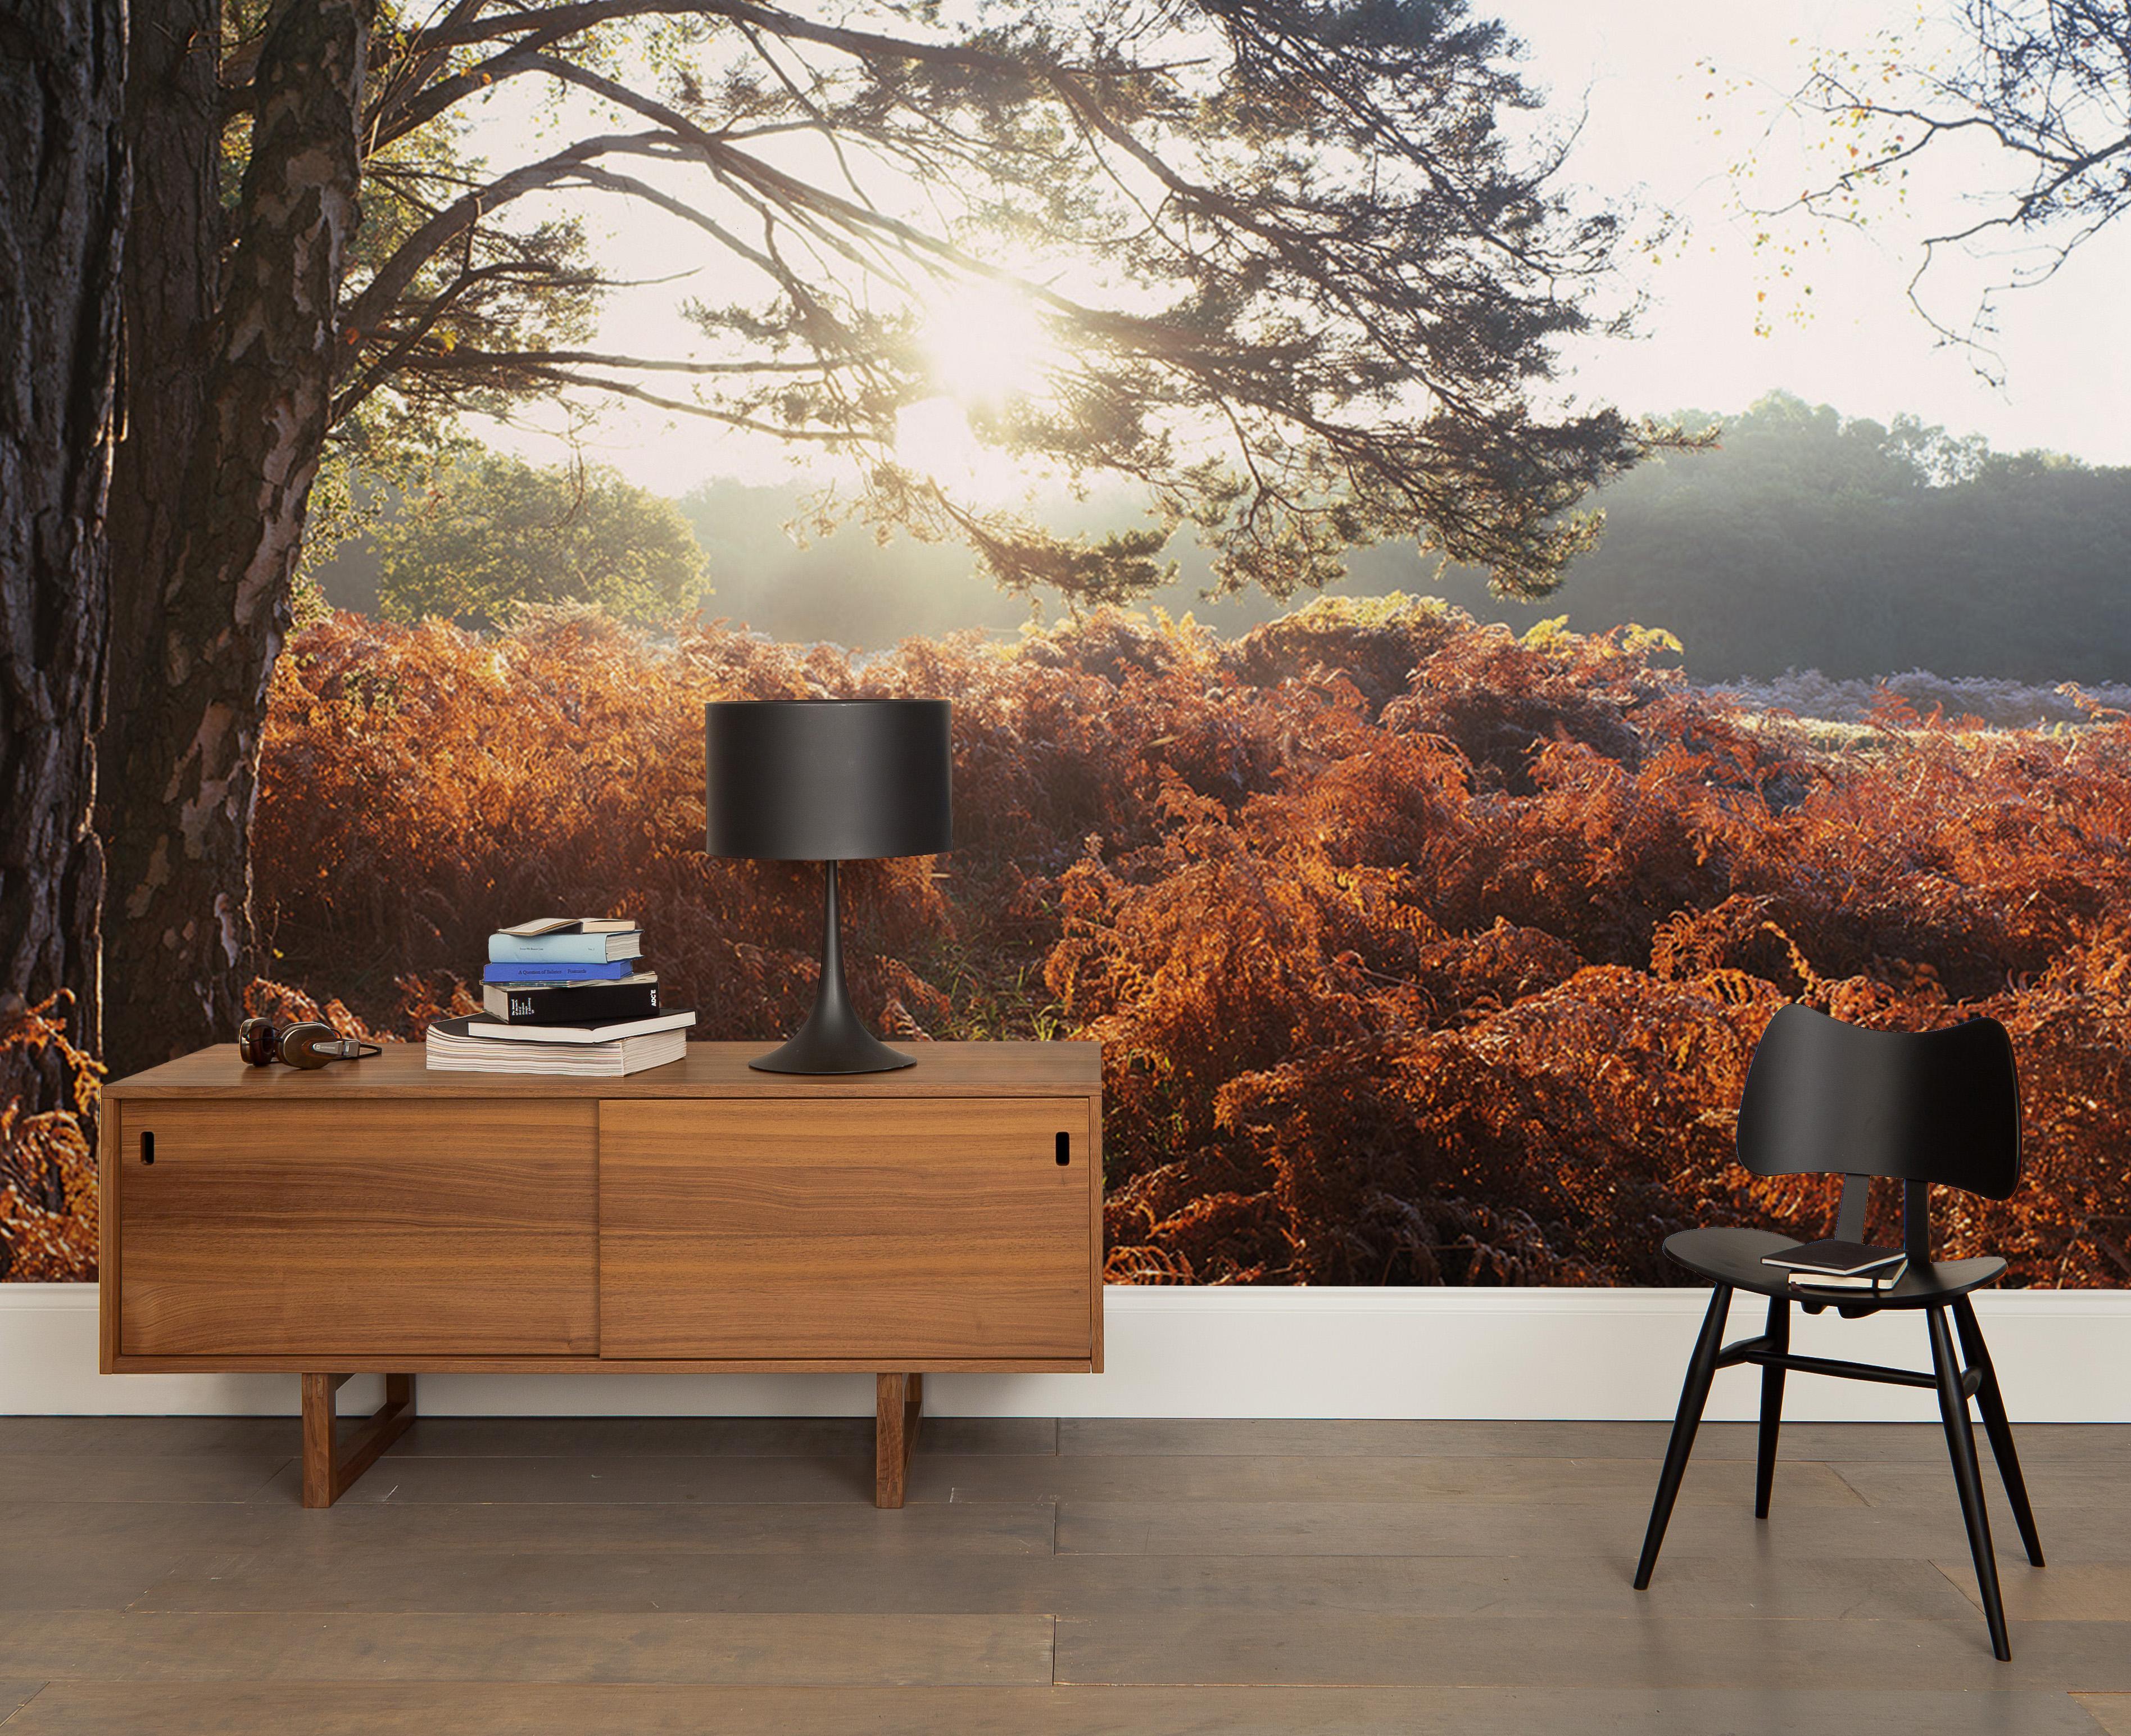 optisch vergr ern bilder ideen couchstyle. Black Bedroom Furniture Sets. Home Design Ideas